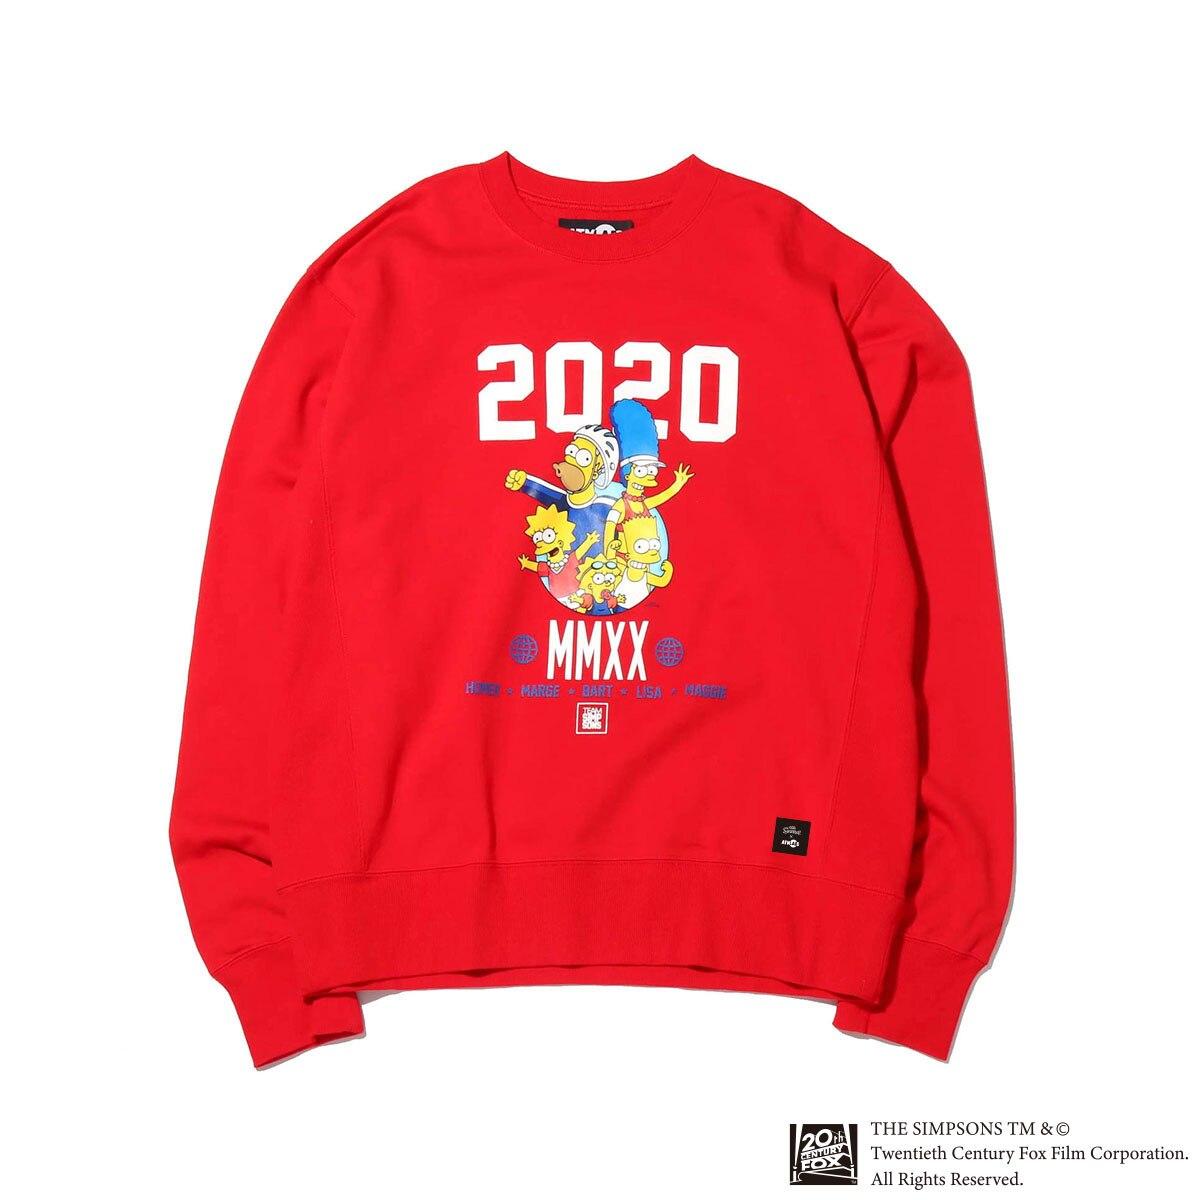 ATMOS LAB x THE SIMPSONS 2020 FAMILY CREW(RED)(アトモスラボ ザ シンプソンズ 2020 ファミリー クルー)【メンズ】【スウェット】【20SP-S】